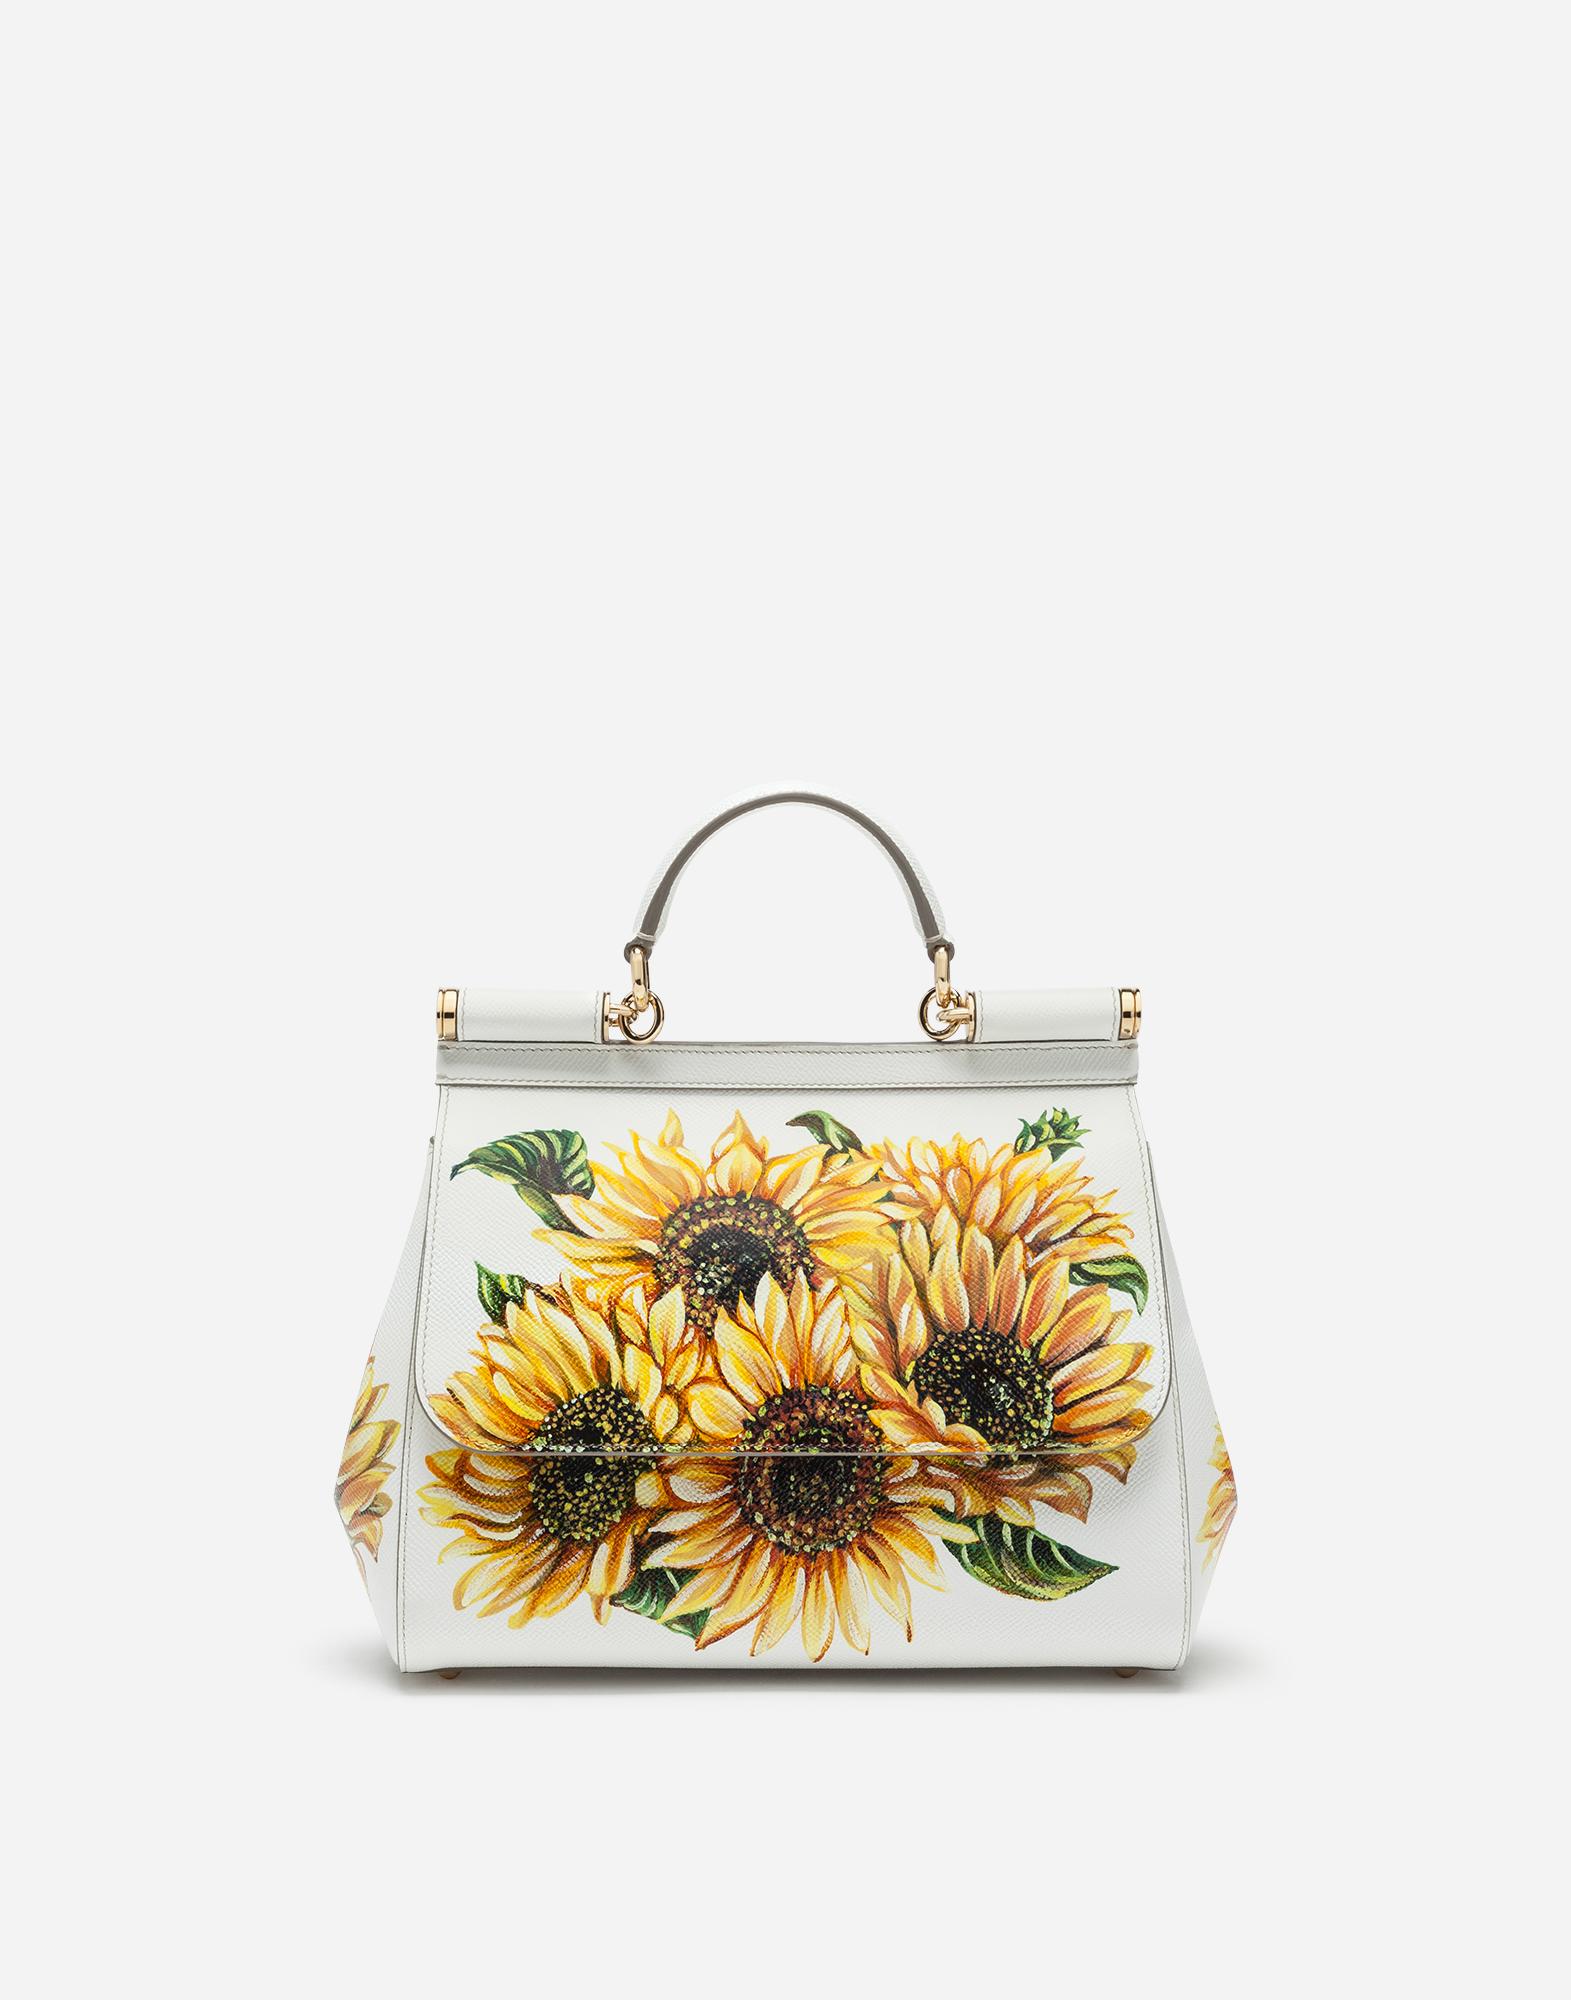 Dolce & Gabbana Medium Sicily Bag In Sunflower-Print Dauphine Calfskin In Floral Print